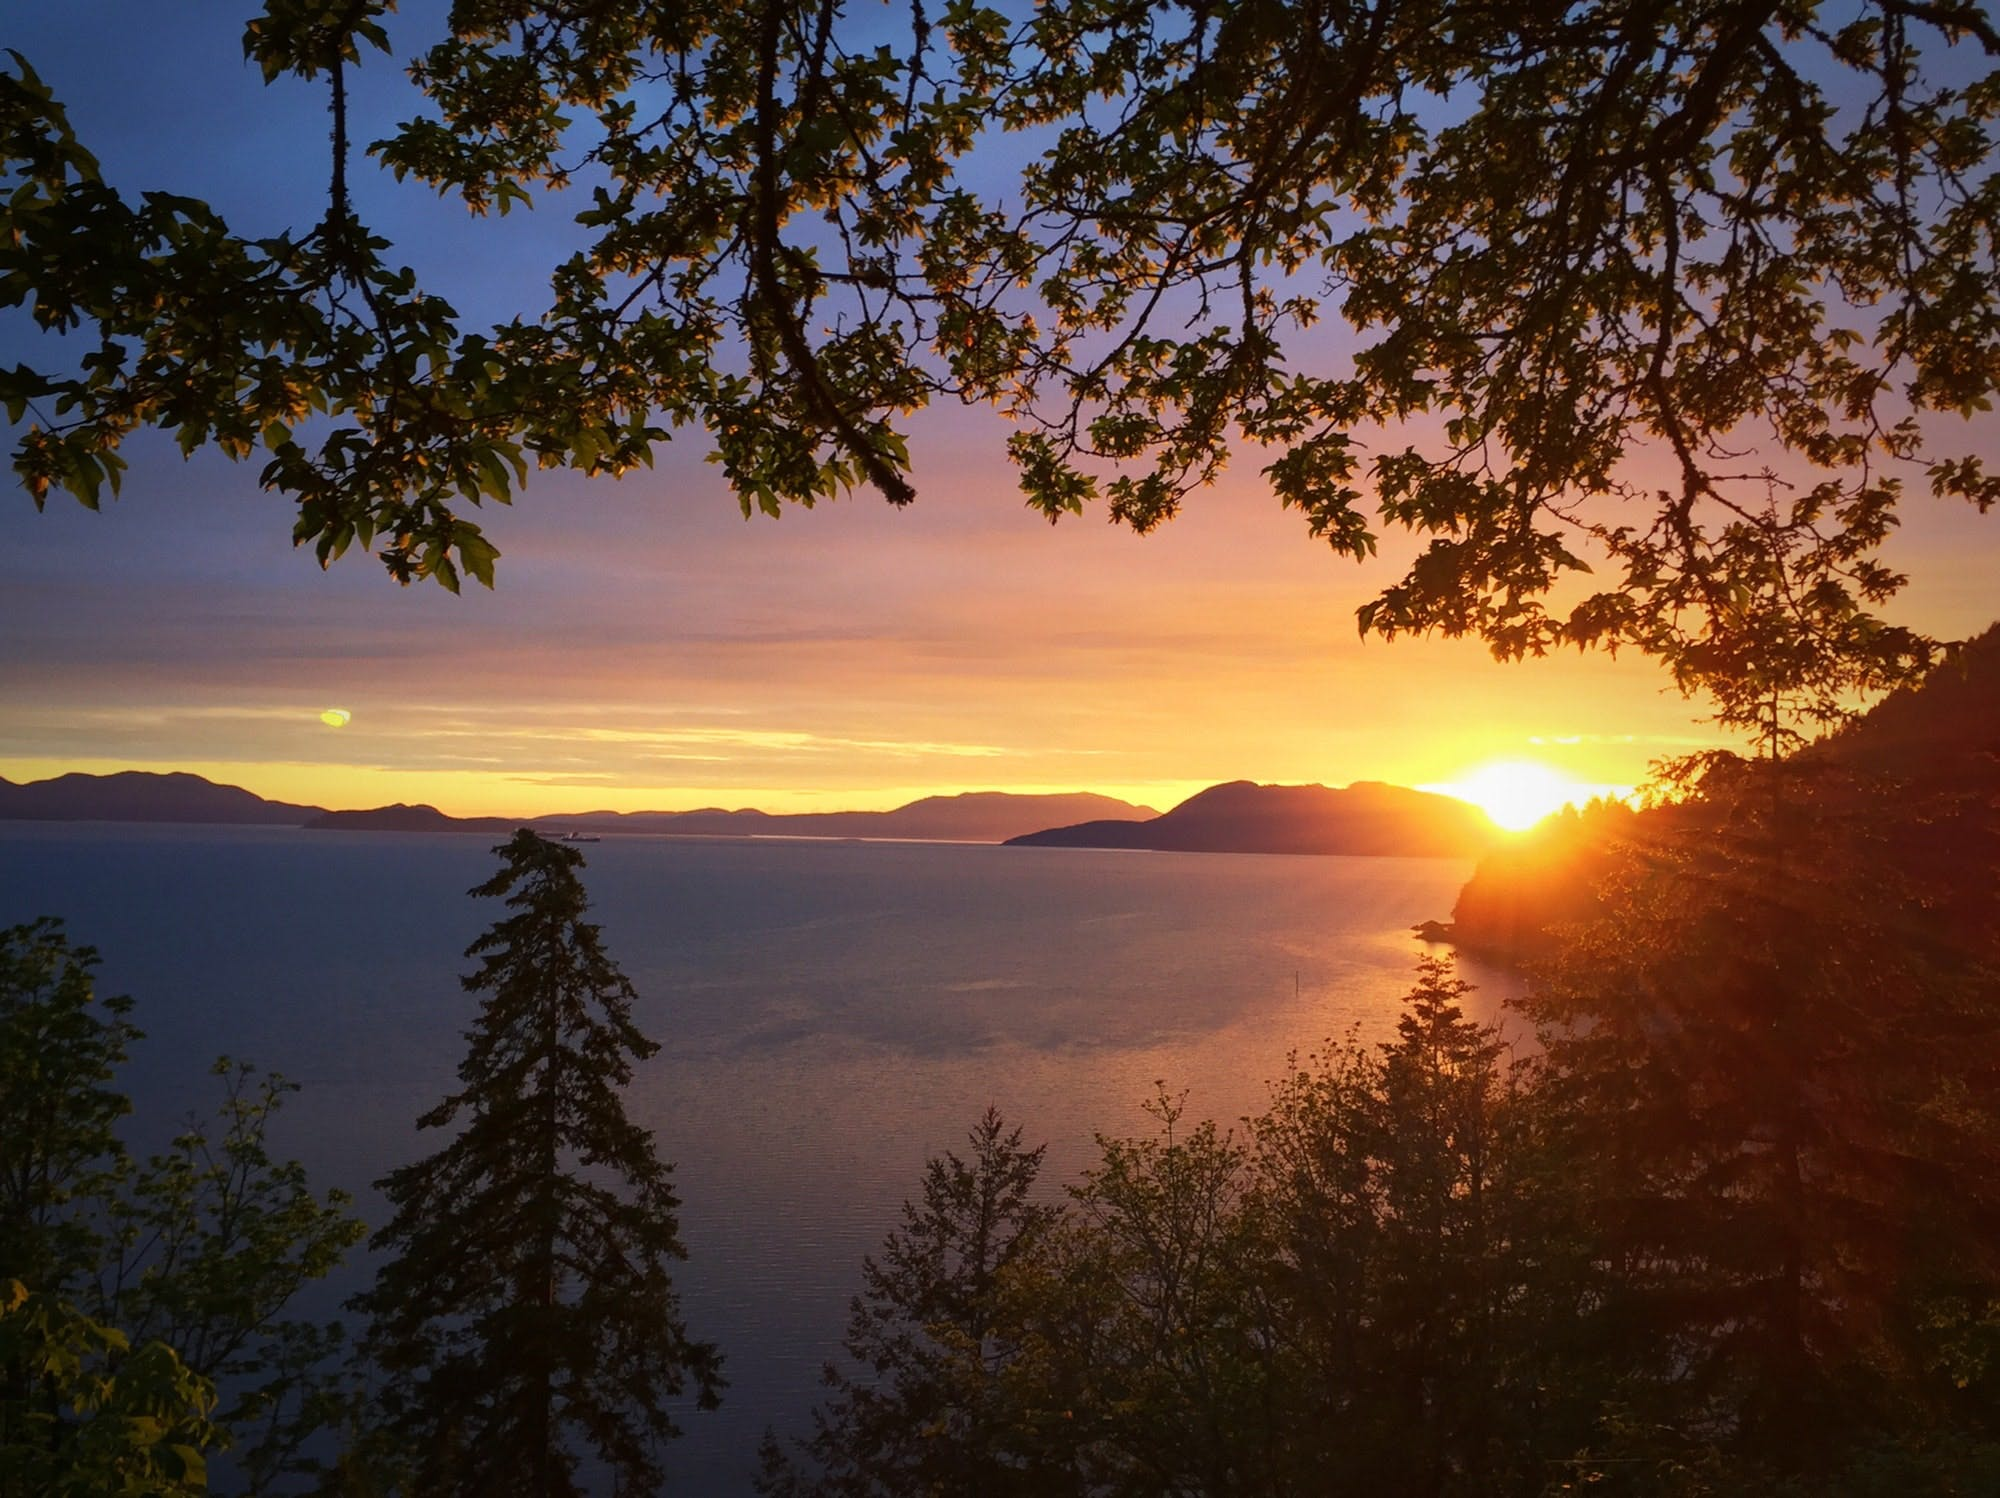 Free stock photo of Sunset Dawn